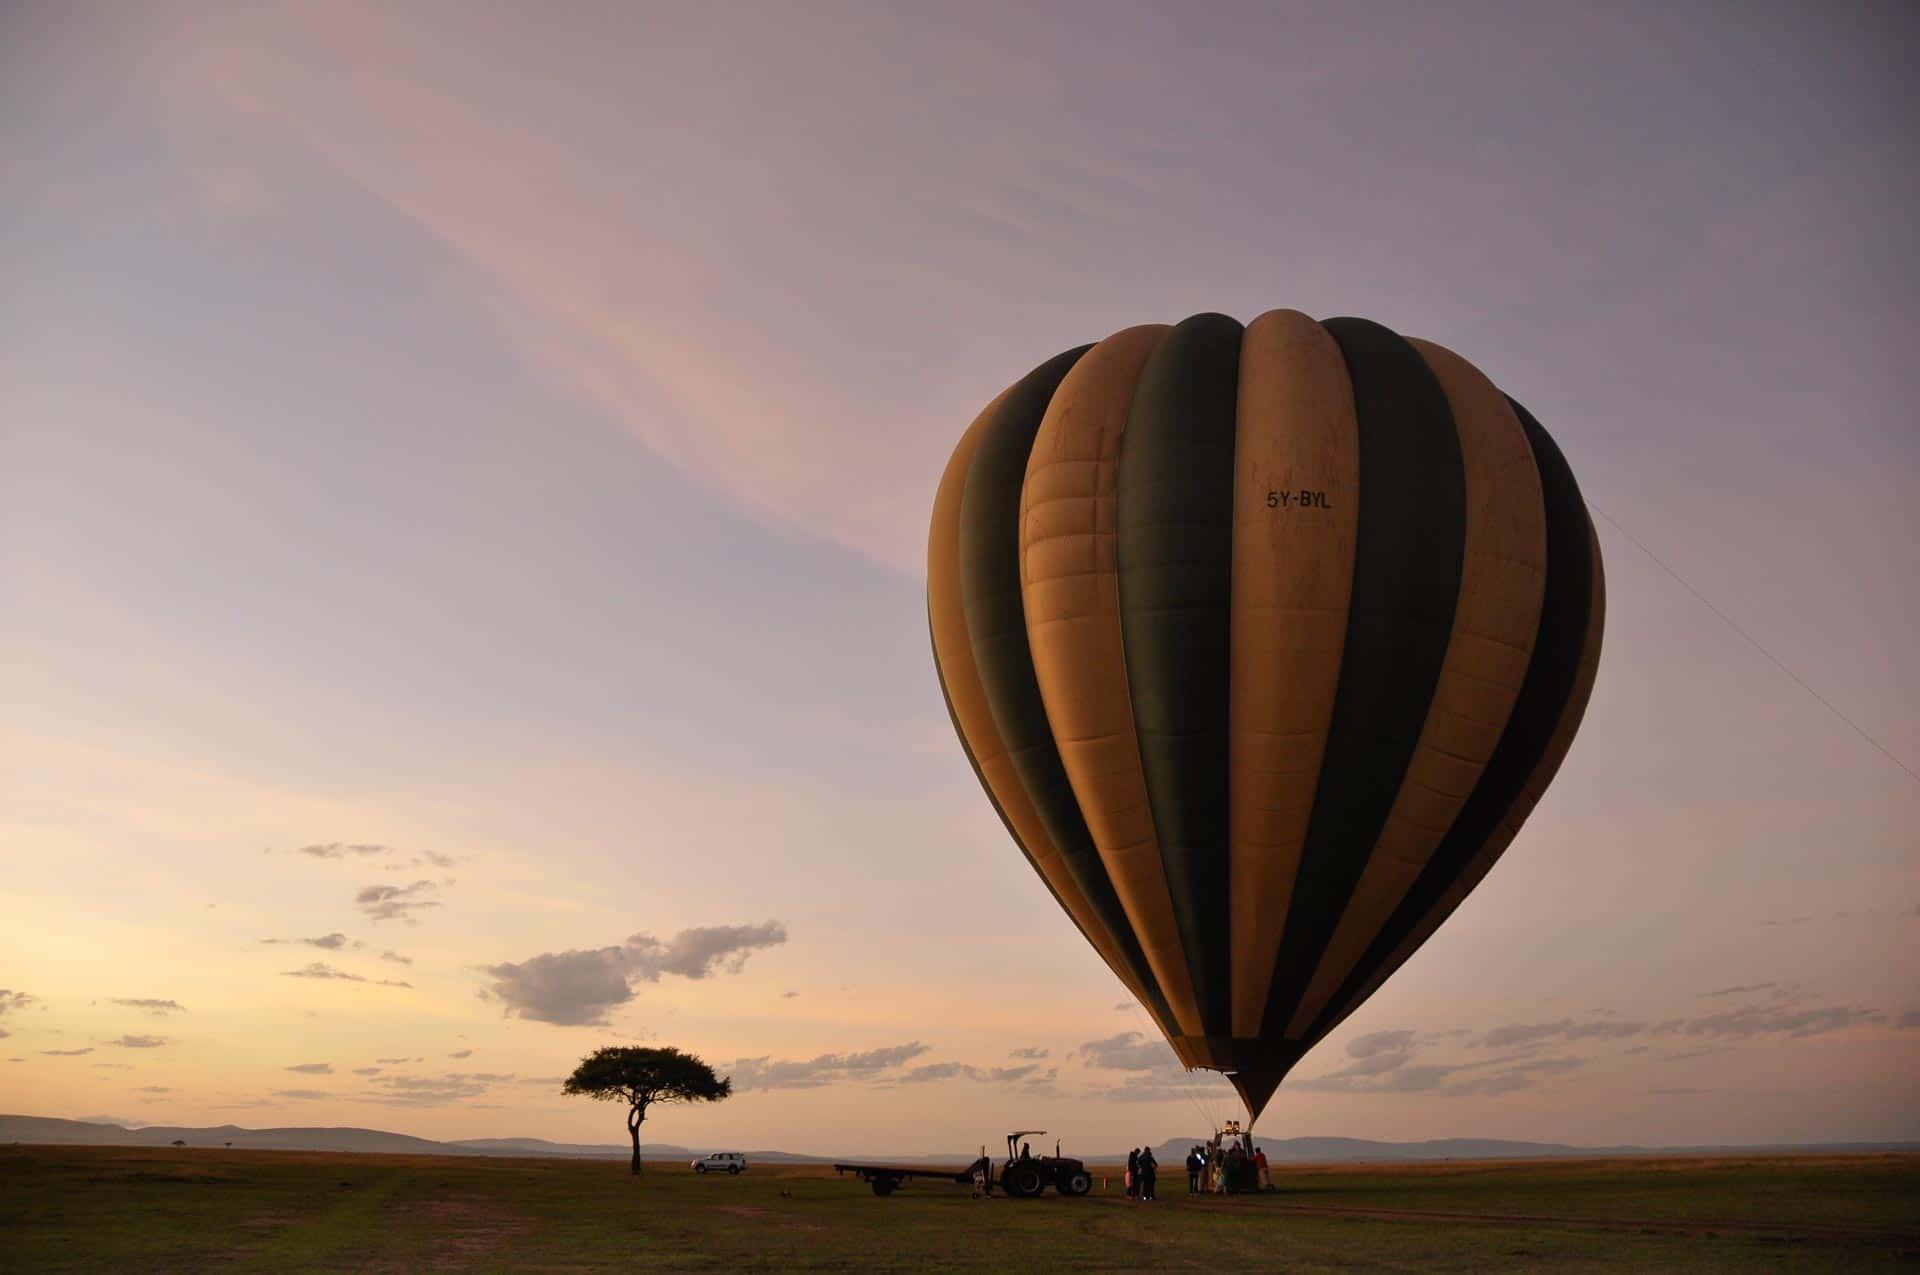 Masai-Mara-Ballonfahrt-Kenia-Globetrotter-Select-4